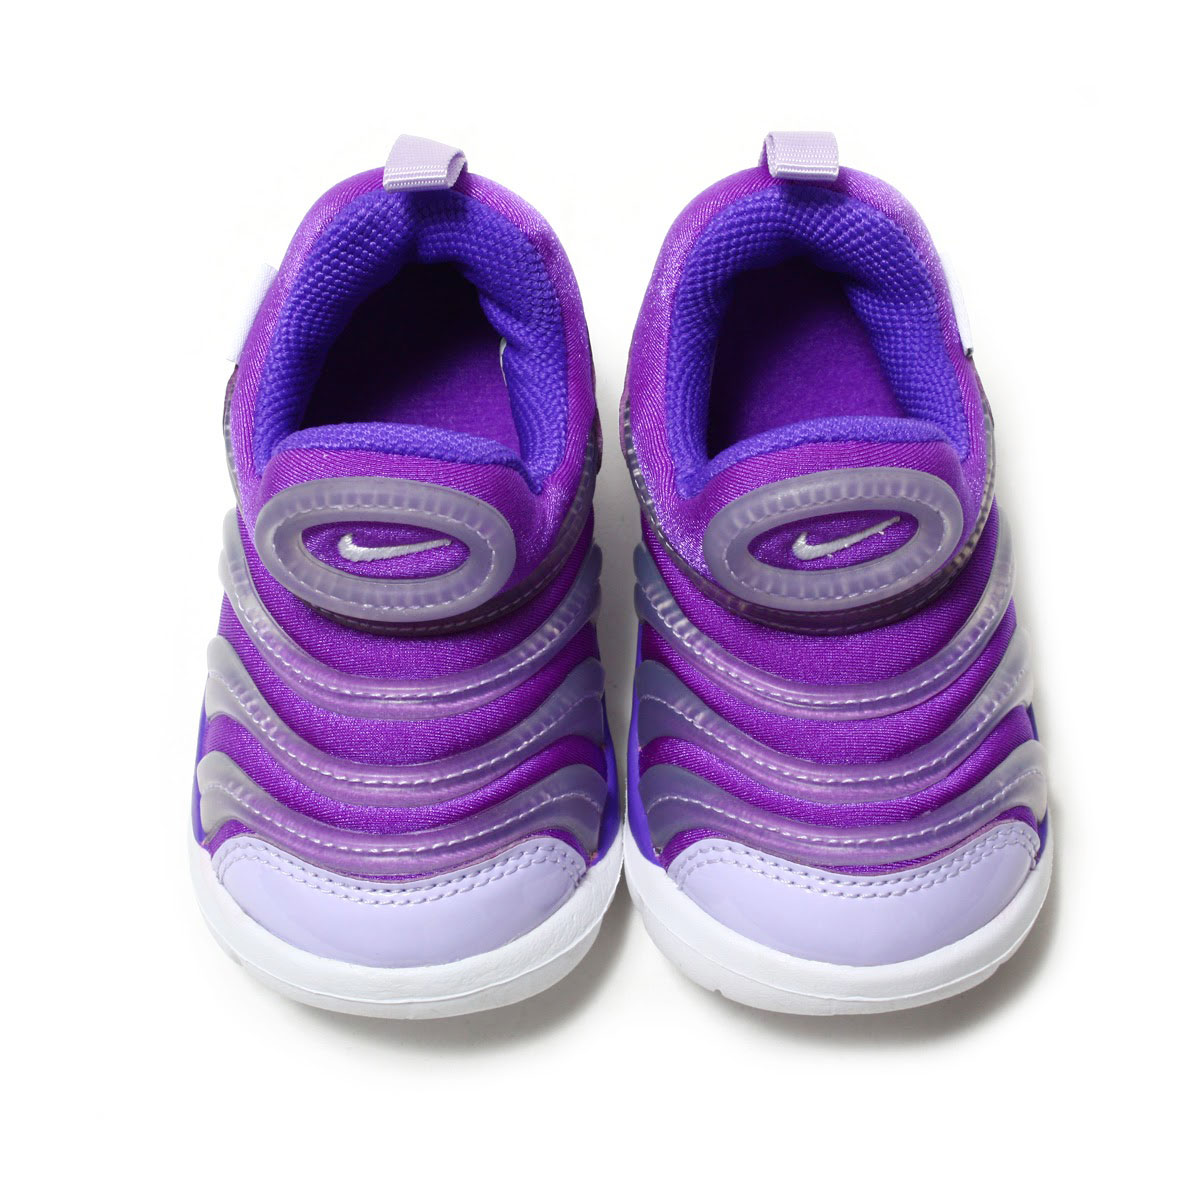 meet 0e18e eb9b9 NIKE DYNAMO FREE (TD) (Nike dynamo-free TD) HYPER GRAPE WHITE-PURPLE AGATE  17FA-I